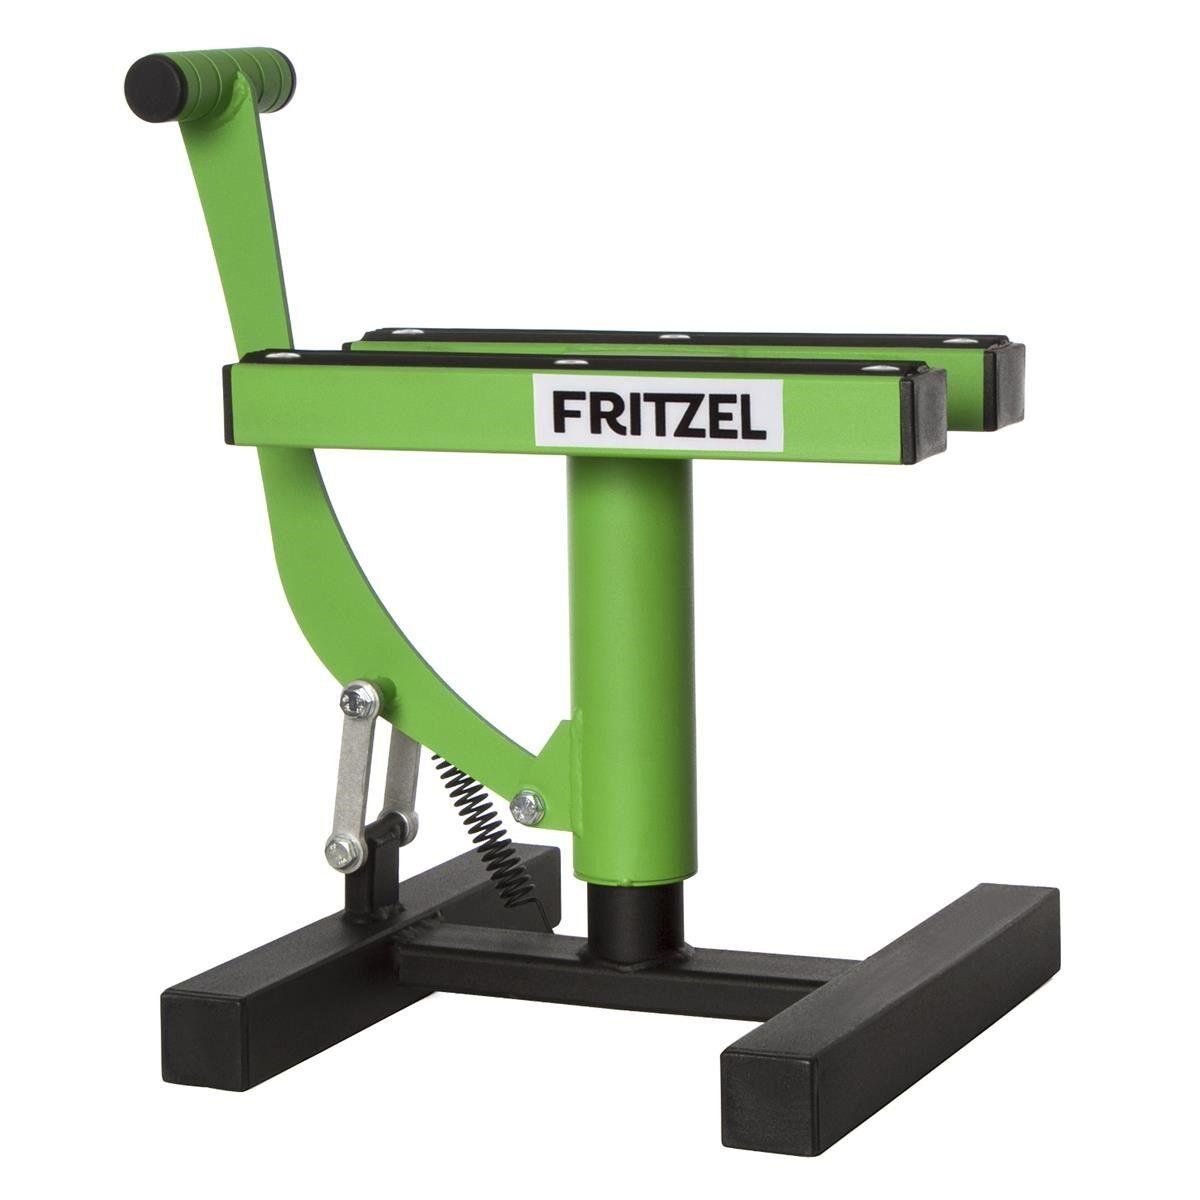 FRITZEL Lève Moto Kleiner Thron - Taille unique - Vert